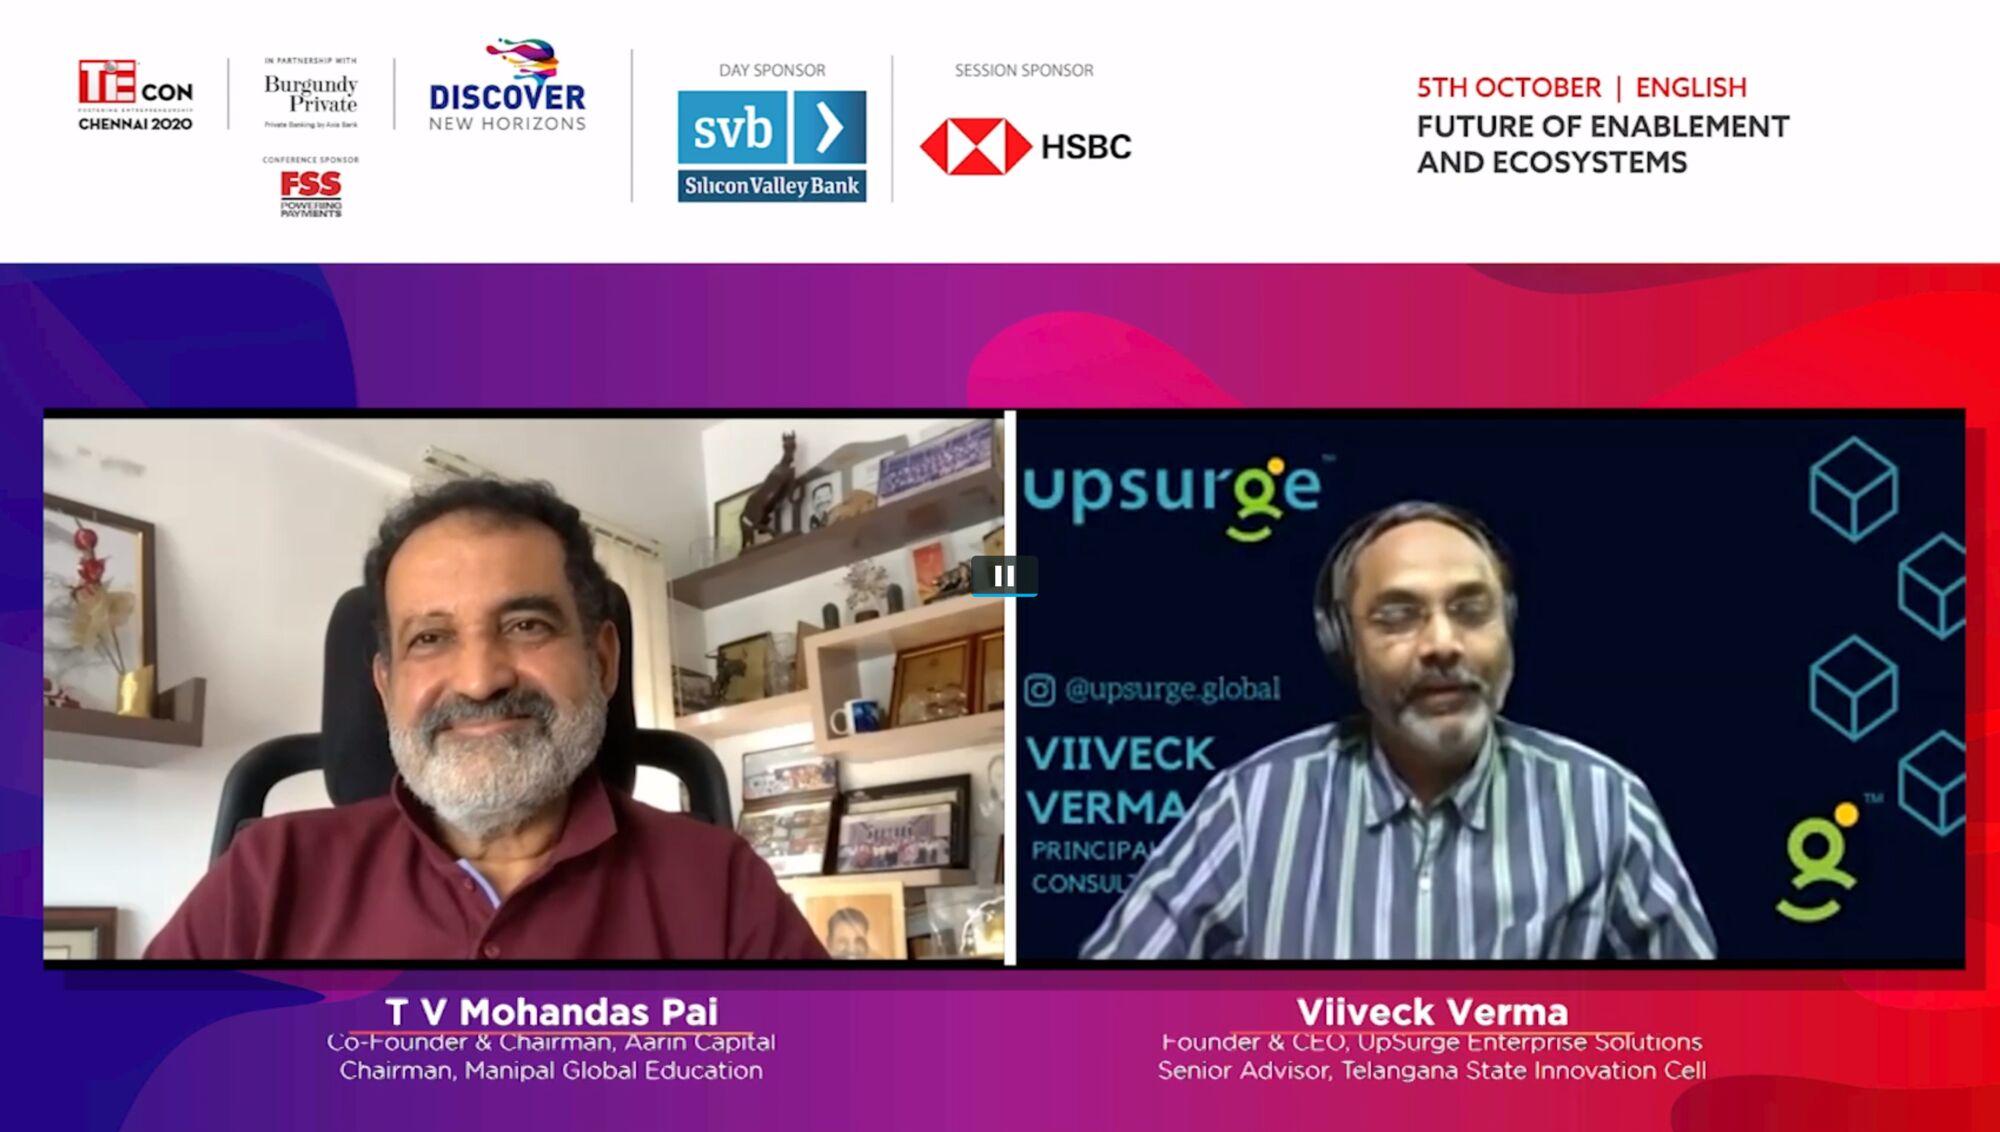 T V Mohandas Pai and Viiveck Verma